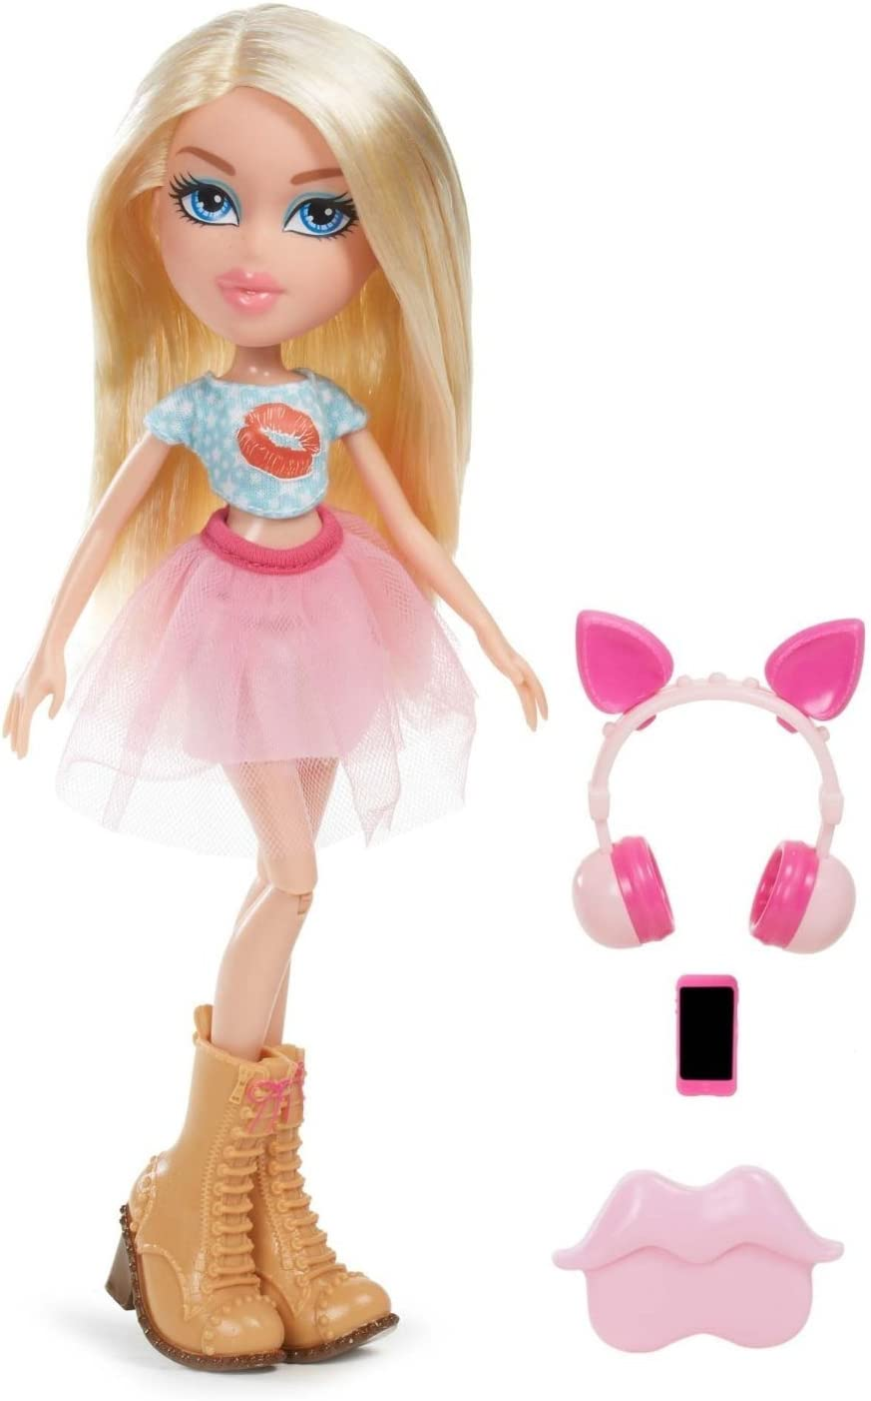 Bratz Remix Doll Cloe Cian, Rosa, Color Blanco muñeca - muñecas (Beige, Cian, Rosa, Color Blanco, Femenino, Chica, 5 año(s), De plástico, CE)